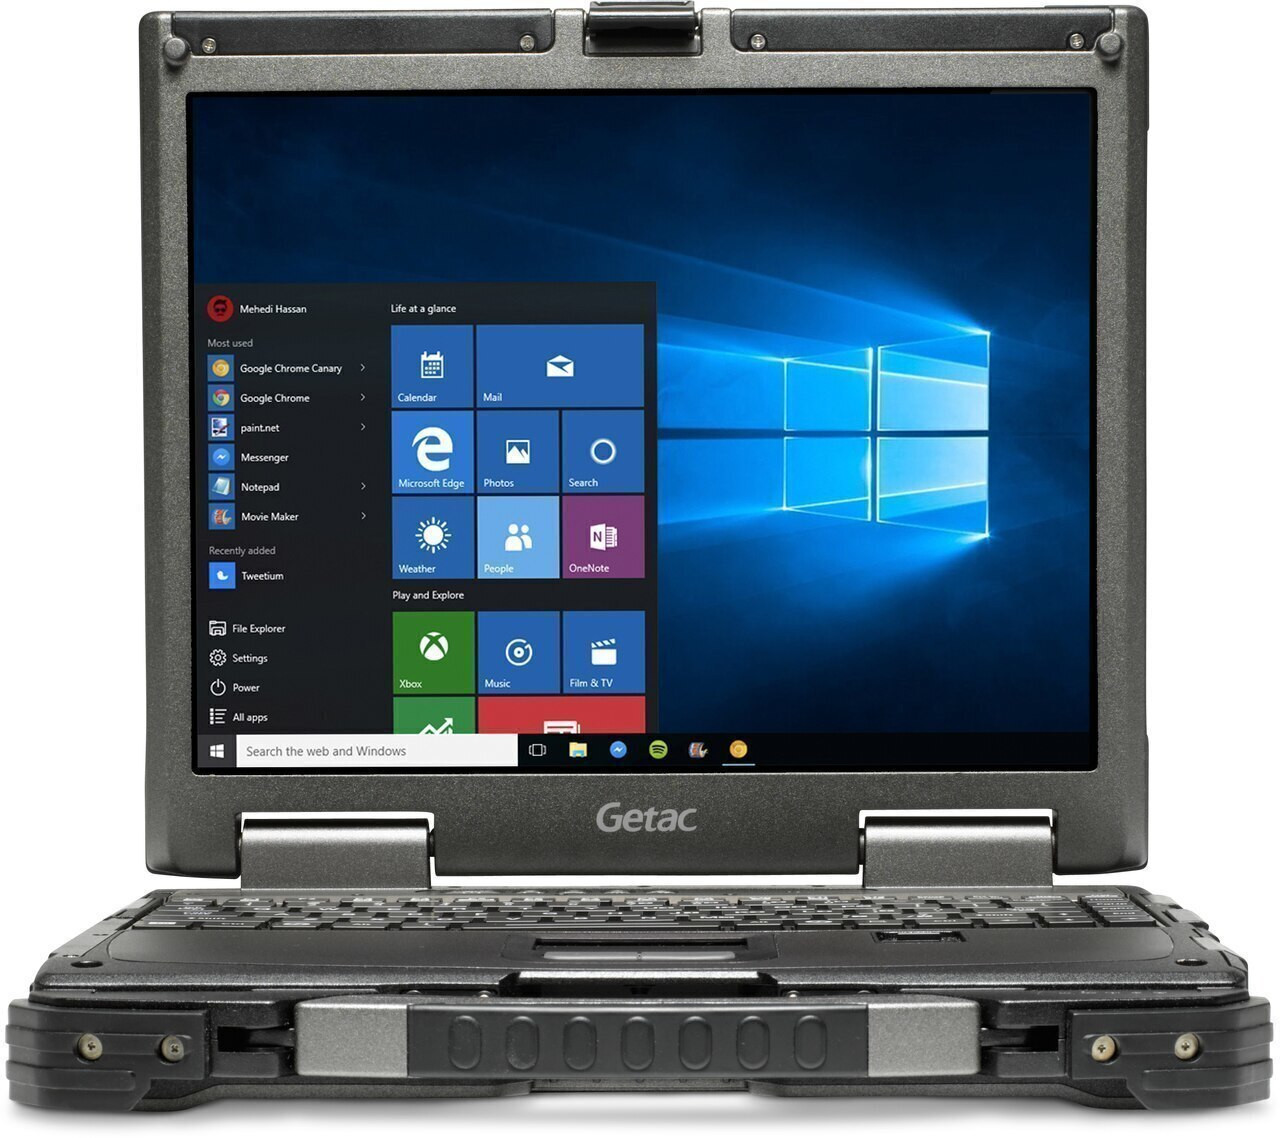 "Getac B300 G7 ,Intel Core i7-8550U Processor 1.8GHz,13.3"" W/ DVD Super-Multi+Smart Card Reader,Win10 Pro x64 w/ 16GB RAM ,256GB SSD,Sunlight Readable (LCD+Touch),Membrane Backlit KBD,Wifi+BT+GPS+Passthrough,HDMI,PCMCIA, Express Card 54, SD Card Reade"